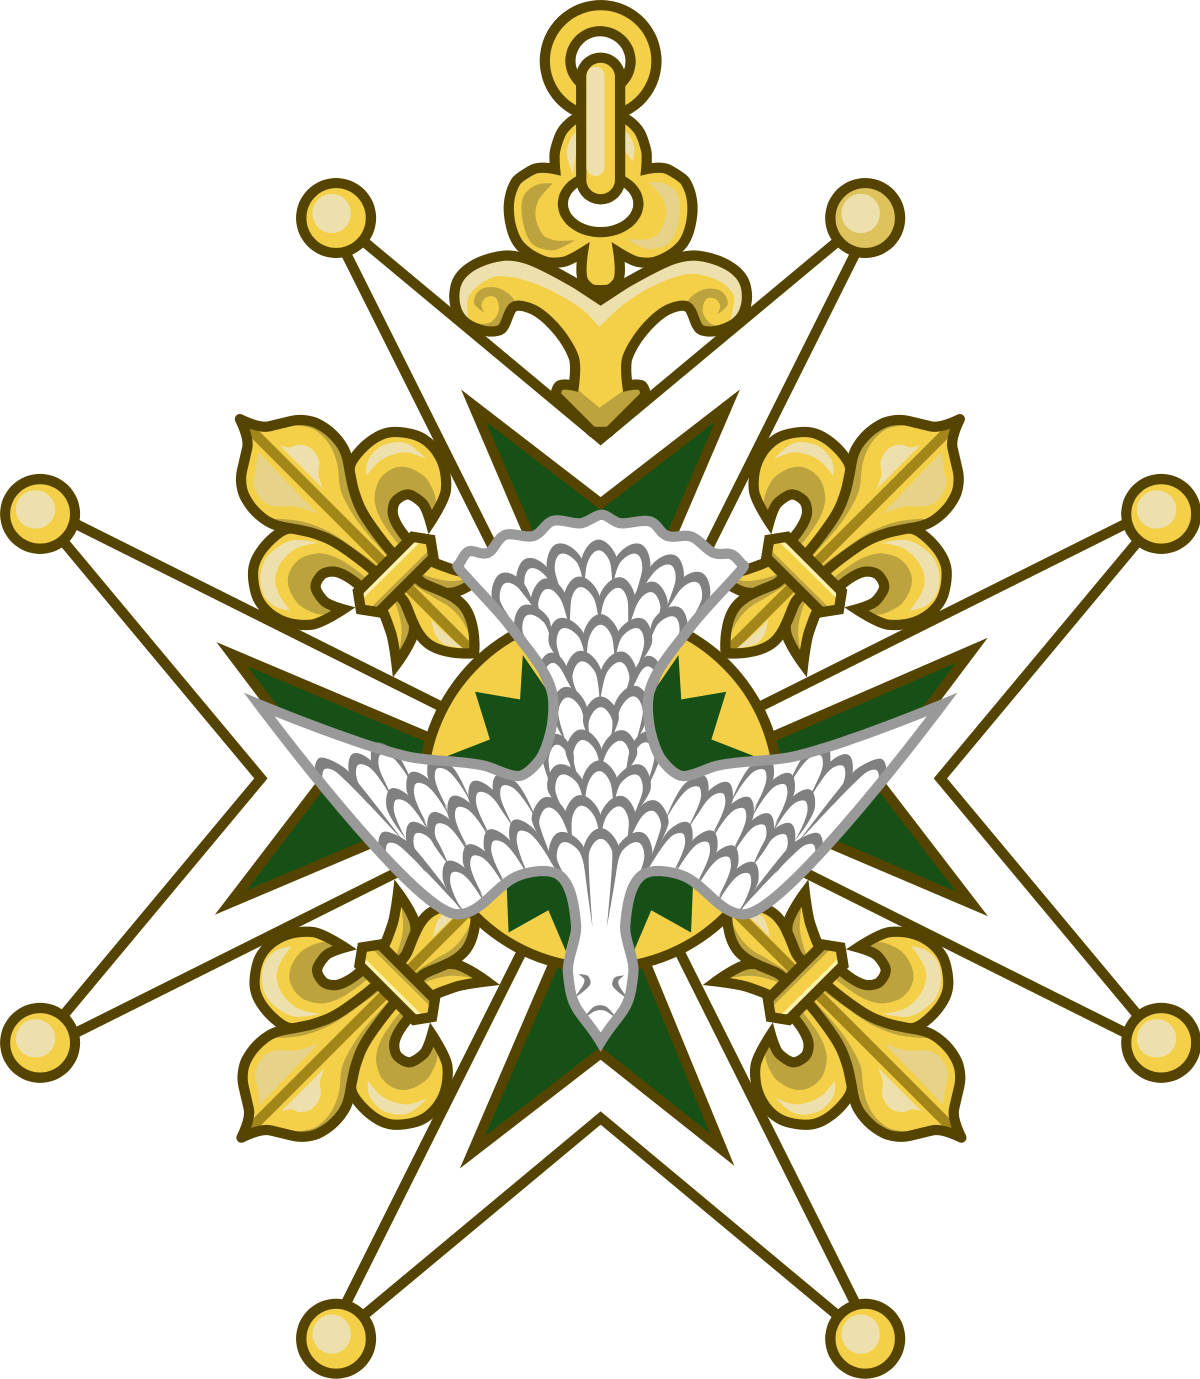 1200x1379 Order Of The Holy Spirit